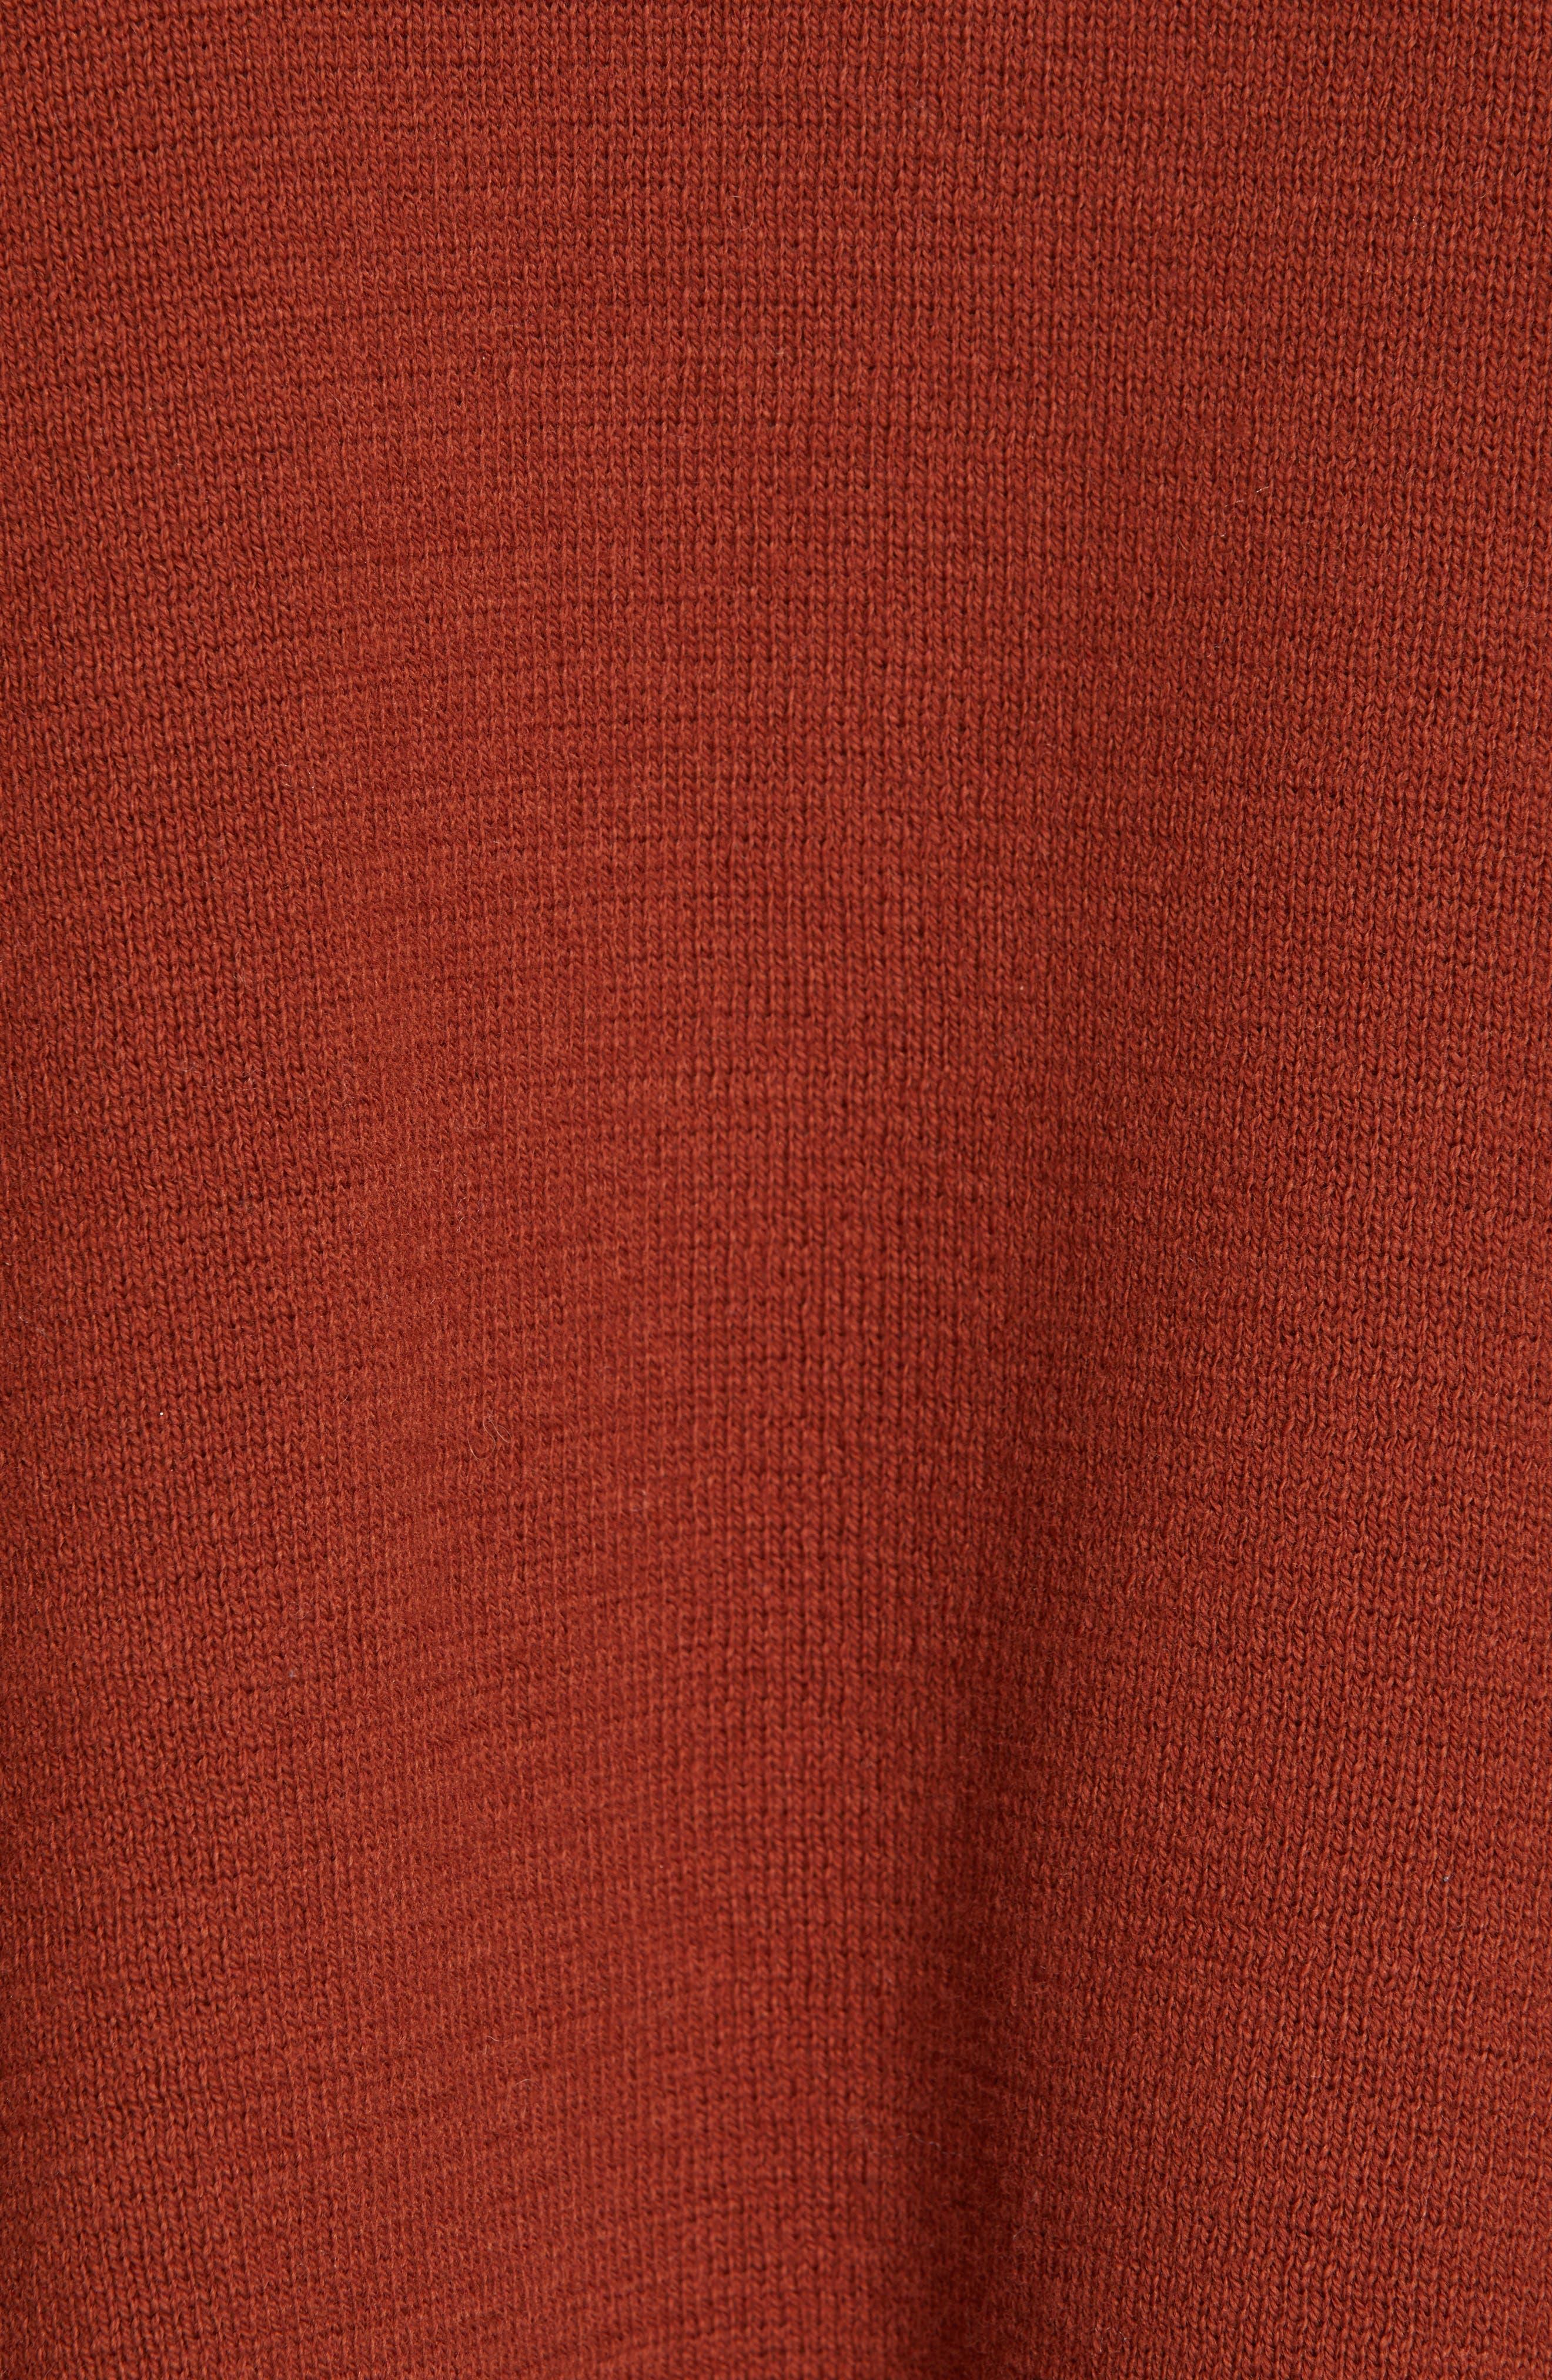 Cropped Sweater,                             Alternate thumbnail 5, color,                             CANYON OAK